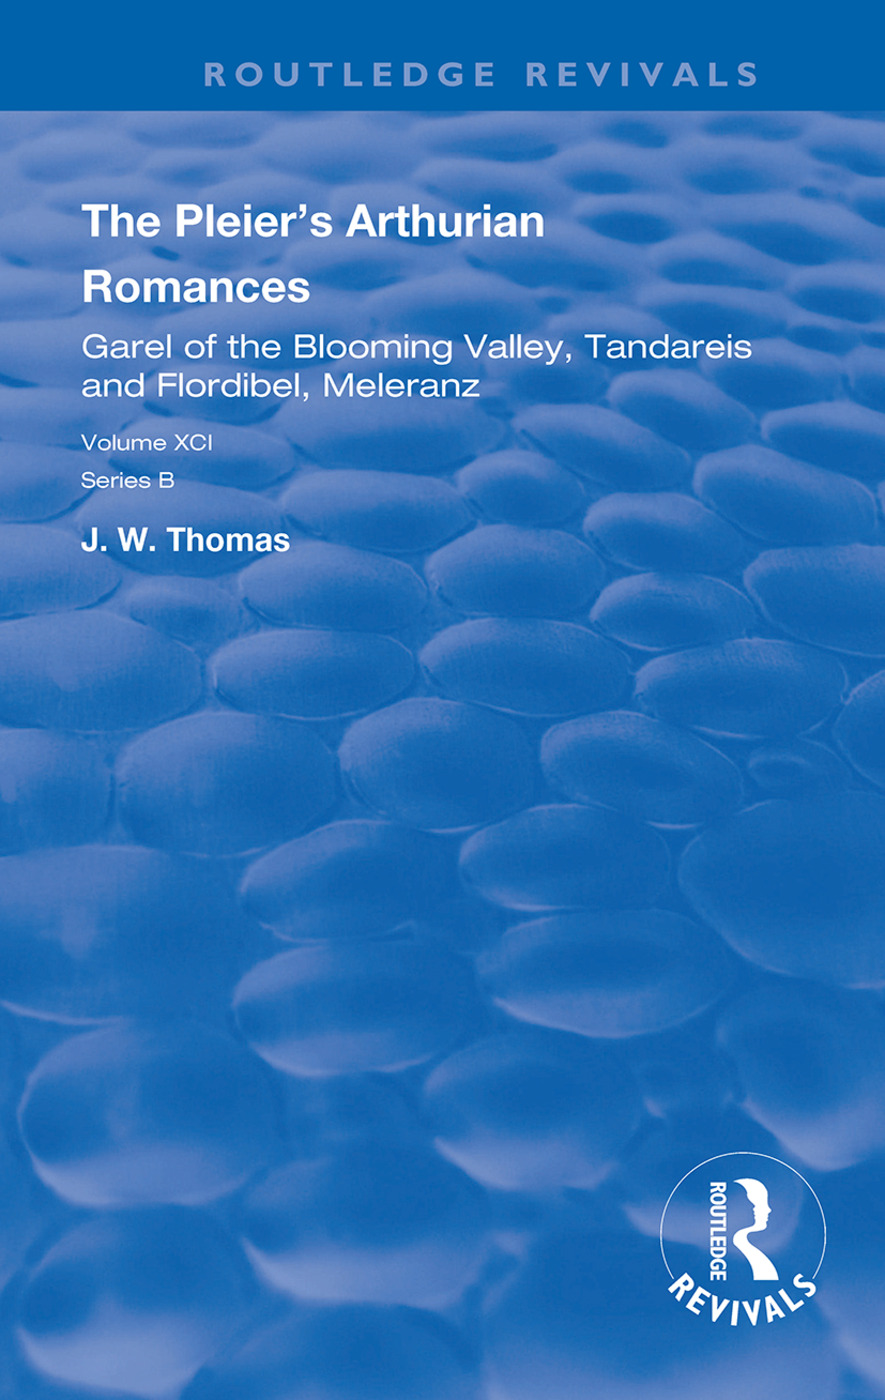 The Pleier's Arthurian Romances: Garel of the Blooming Valley, Tandareis and Floribel, Meleranz, 1st Edition (Hardback) book cover